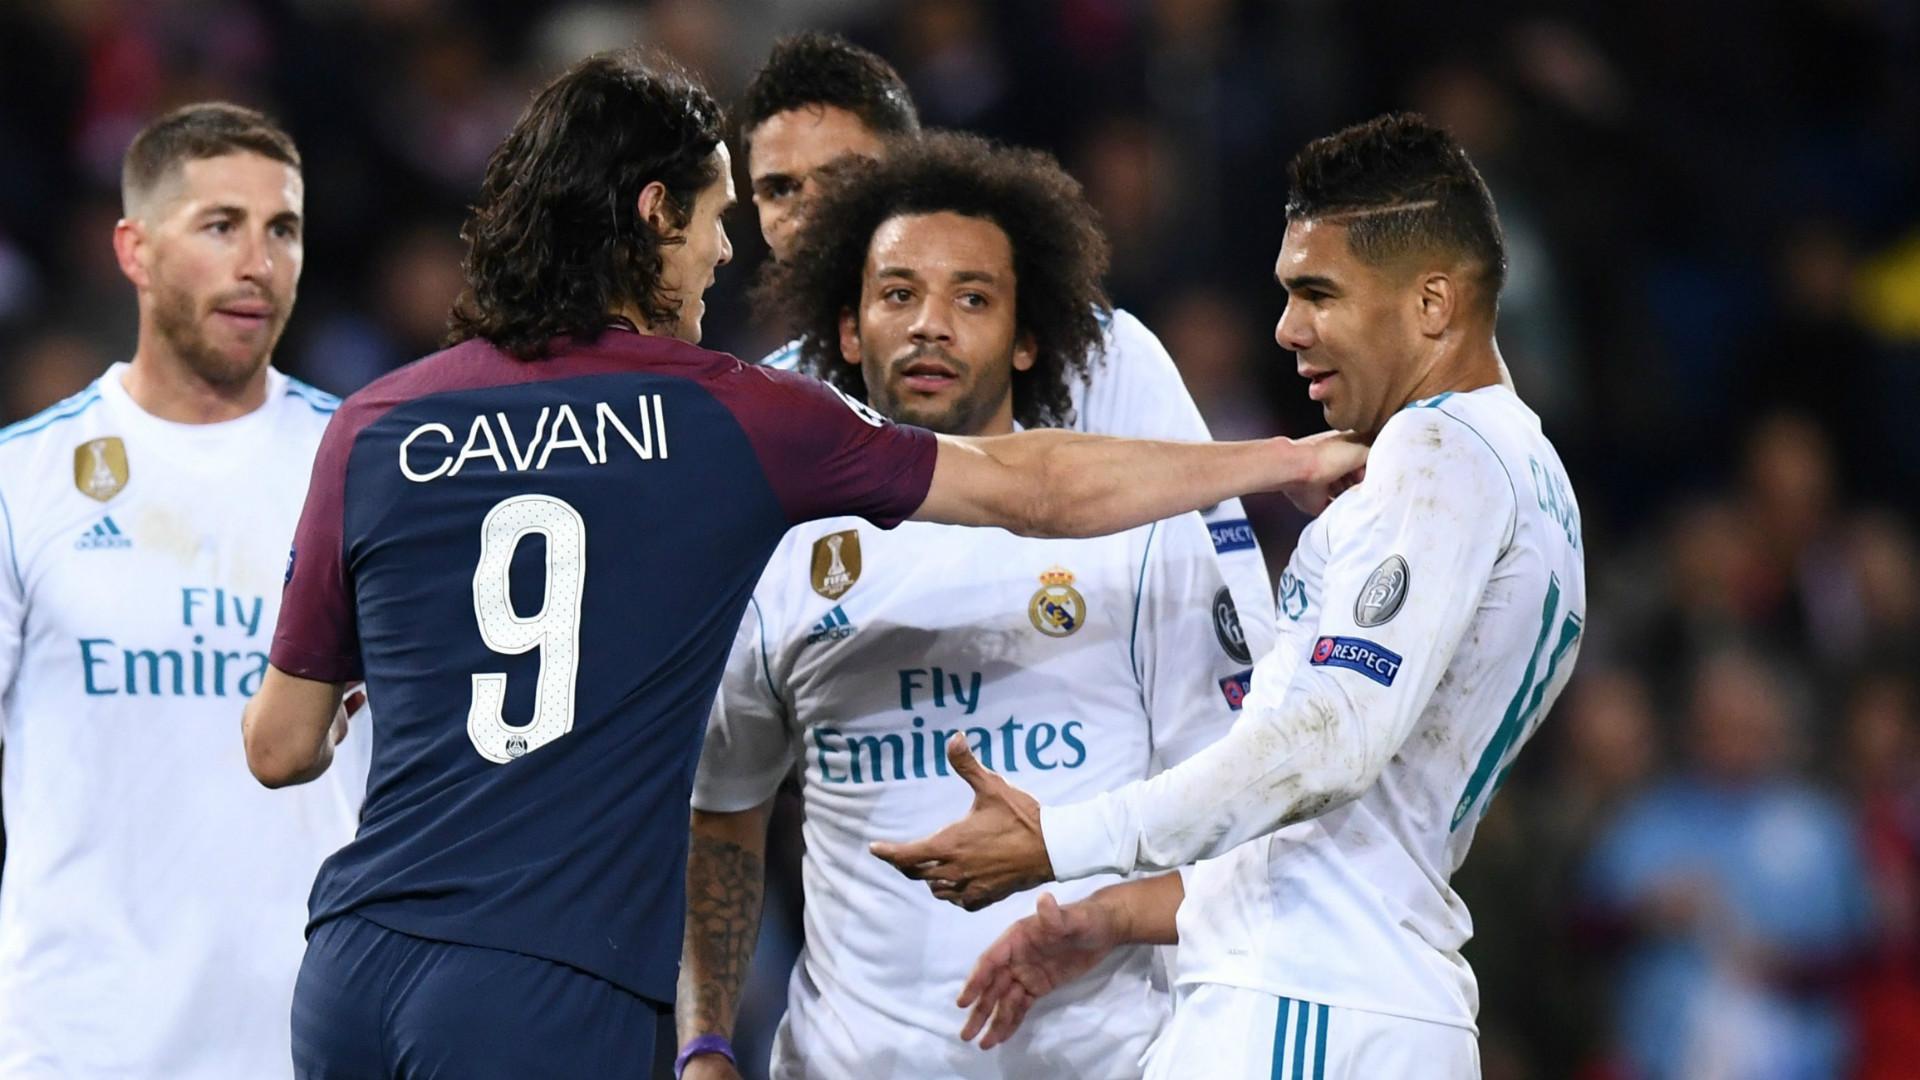 Edinson Cavani Casemiro PSG Paris Saint-Germain Real Madrid